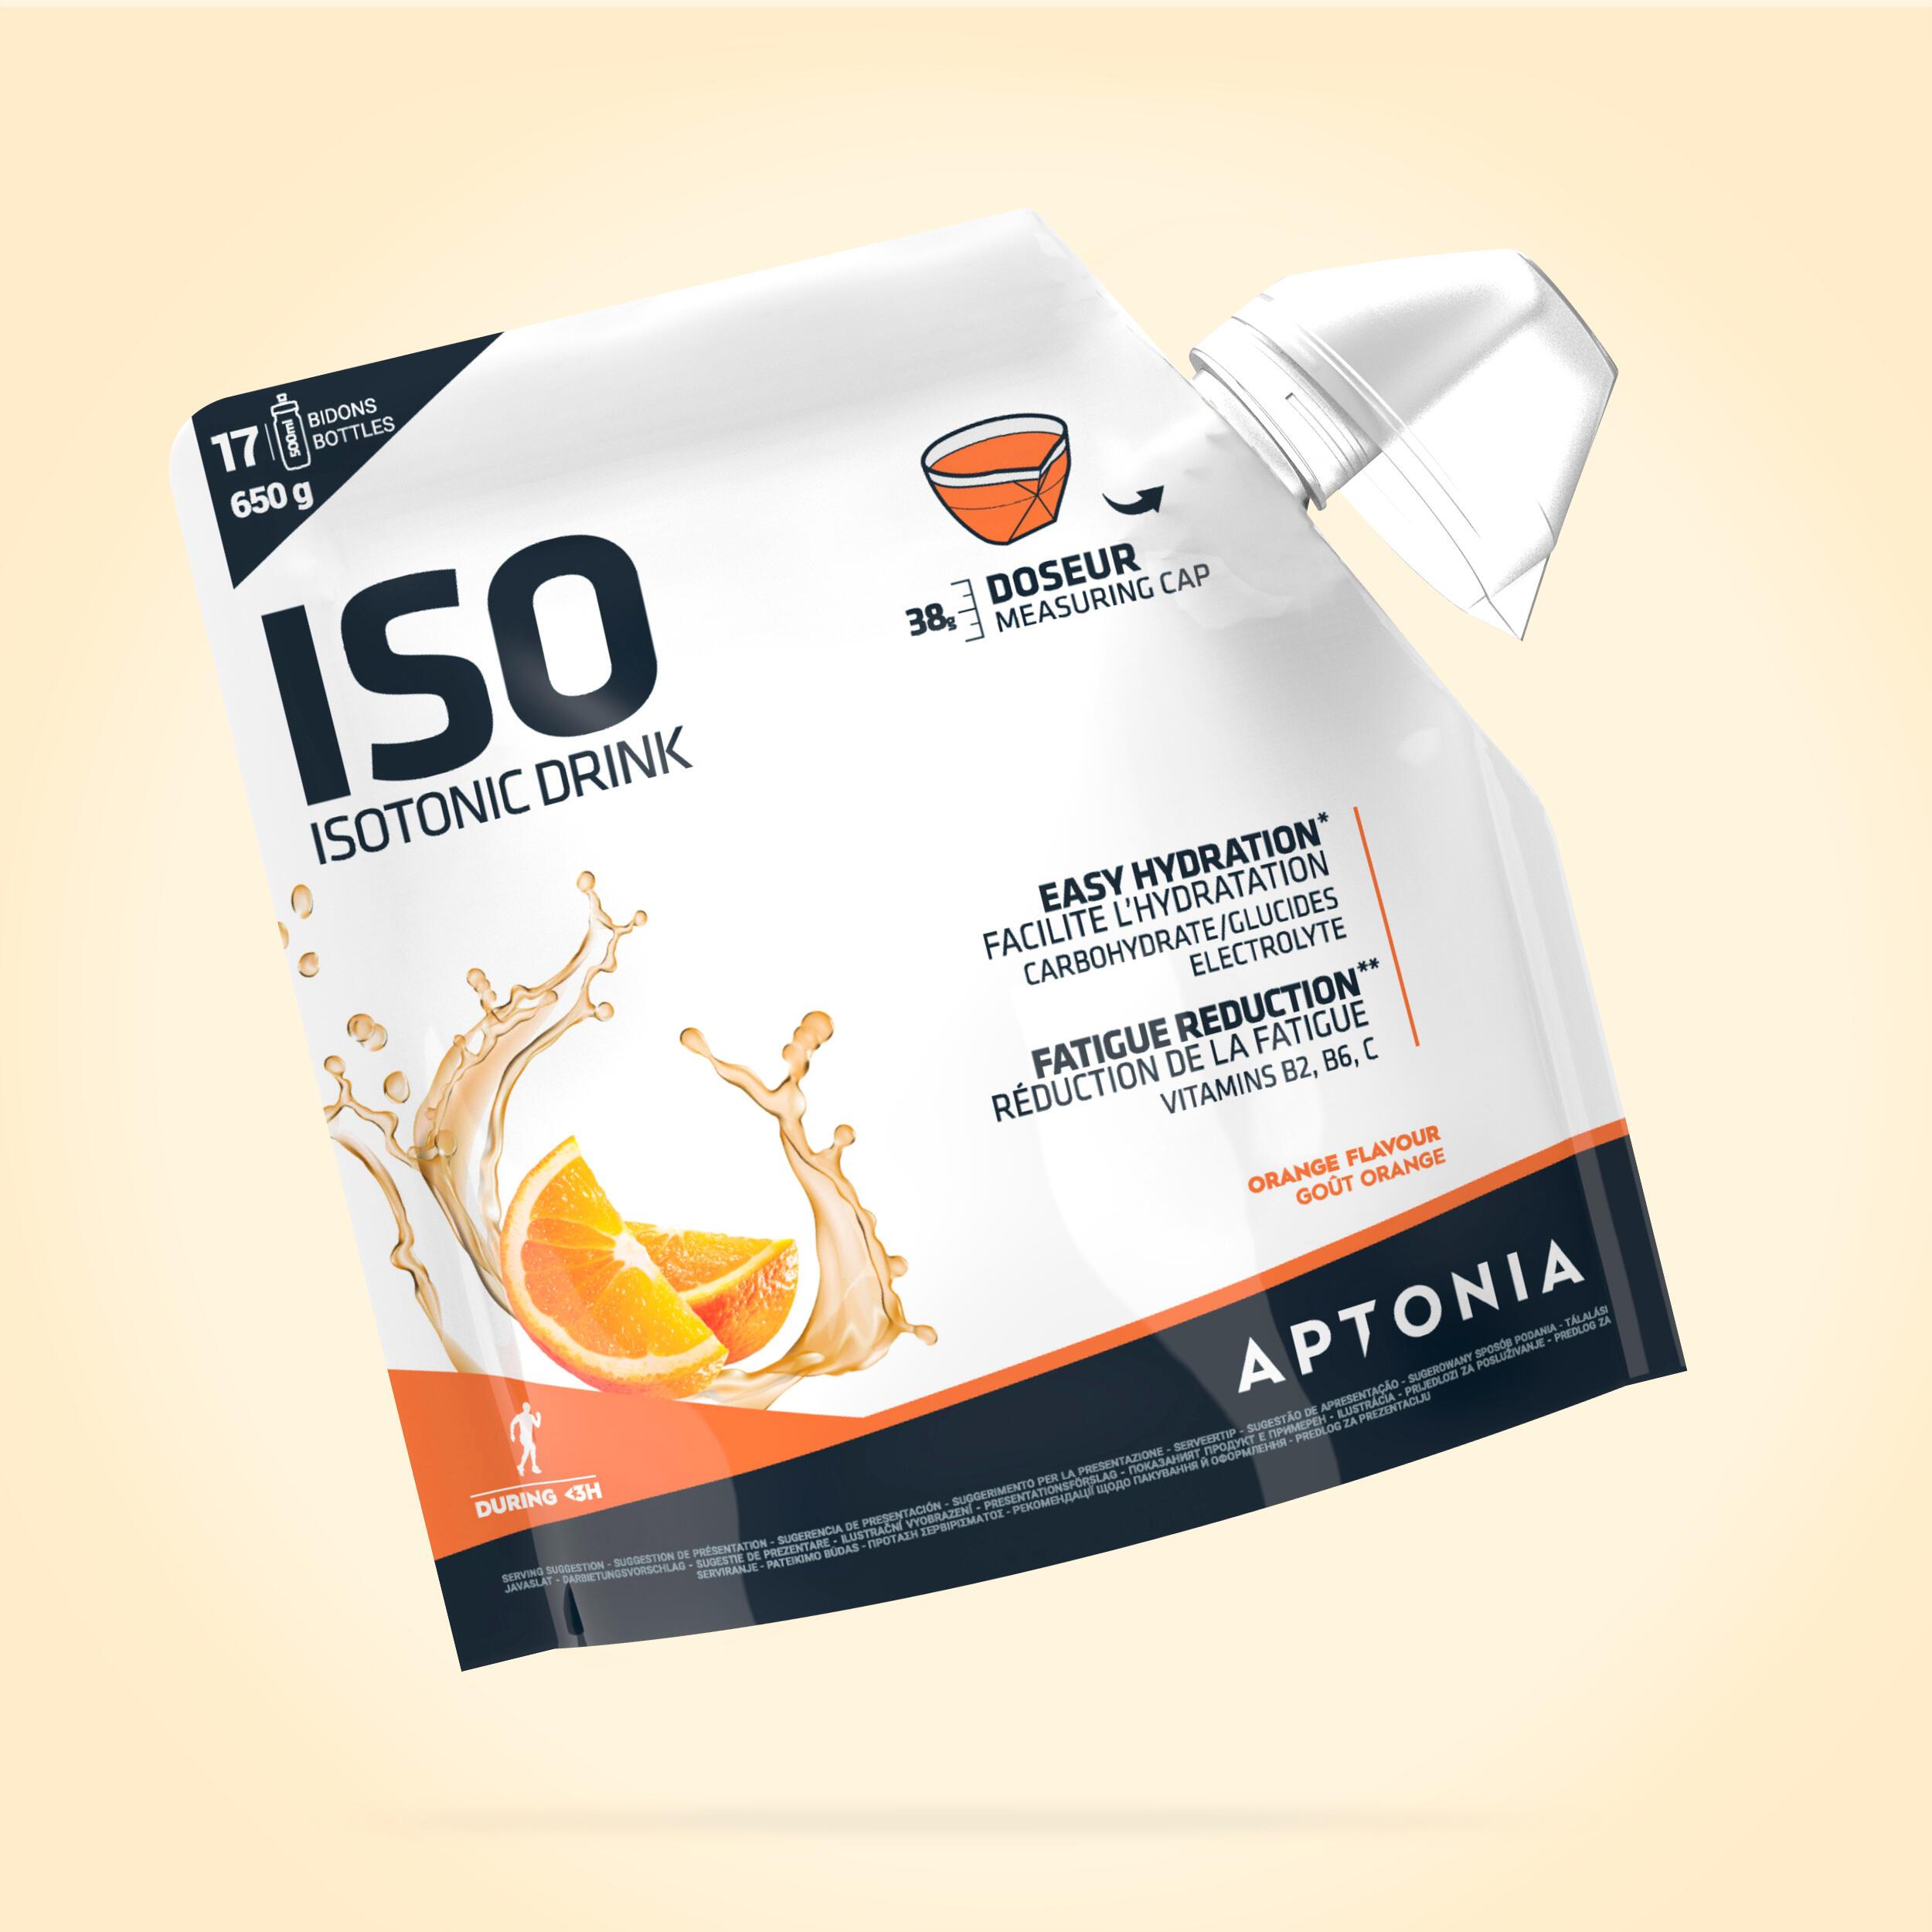 APTONIA. Bevanda isotonica in polvere ISO arancia 650 g